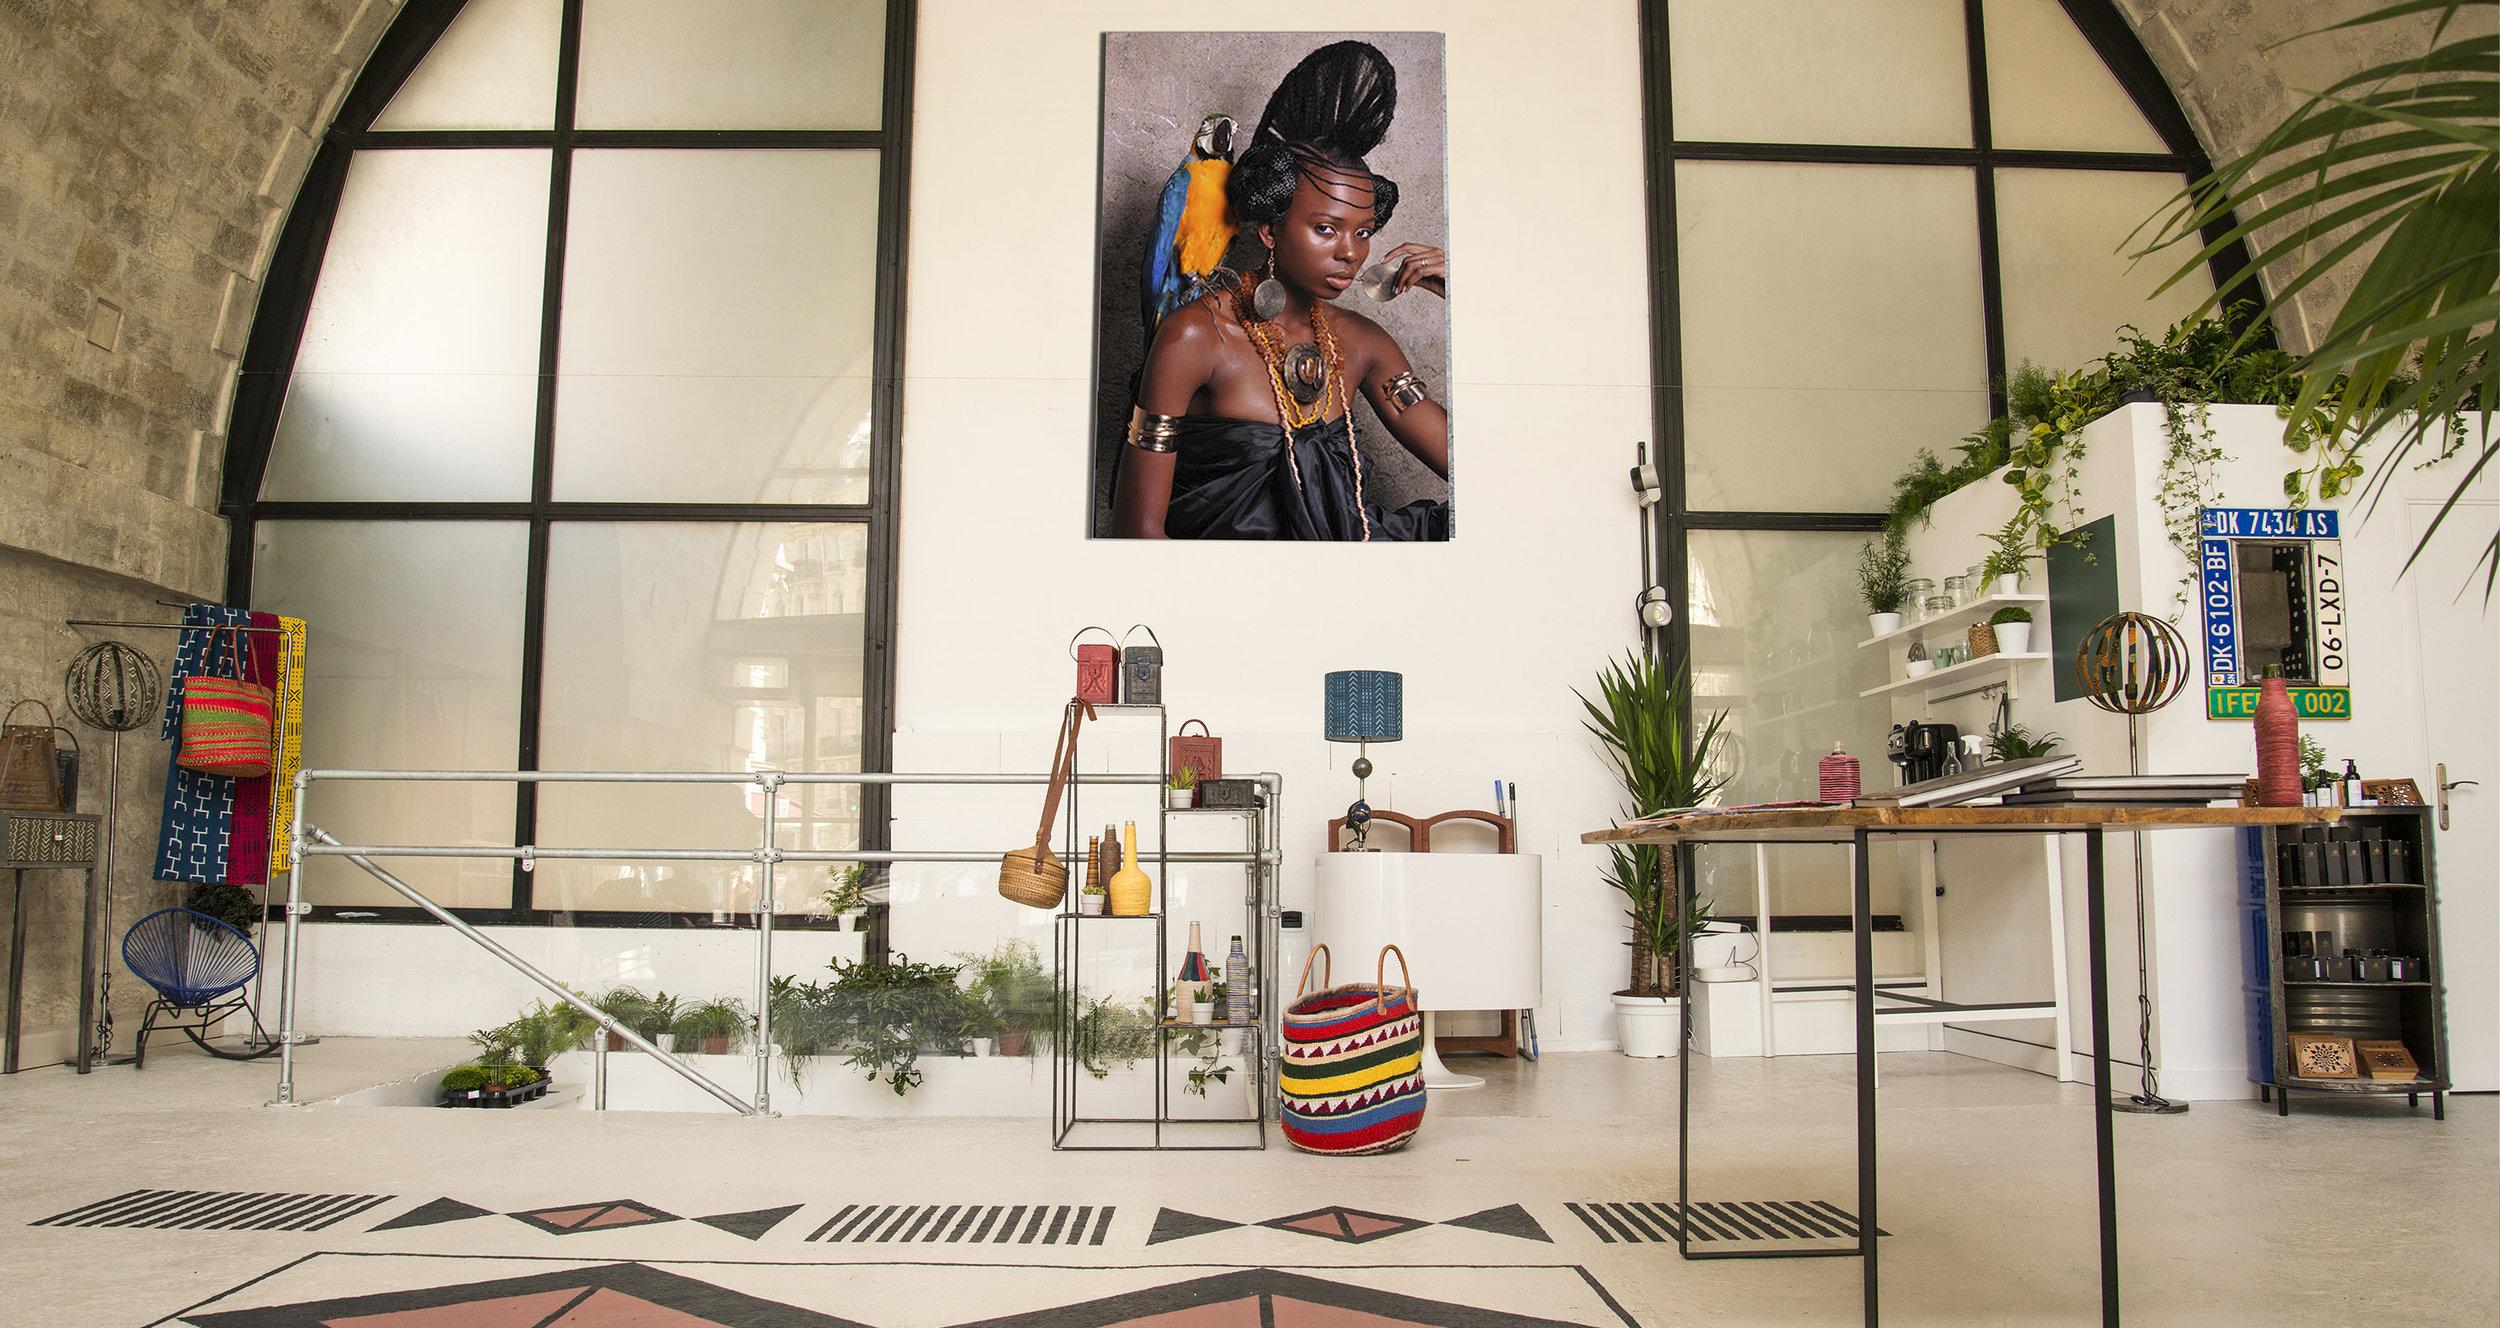 SAARGALE - Find HANIMANNS now at SAARGALE concept store, 47 avenue Daumesnil, 75012 Paris